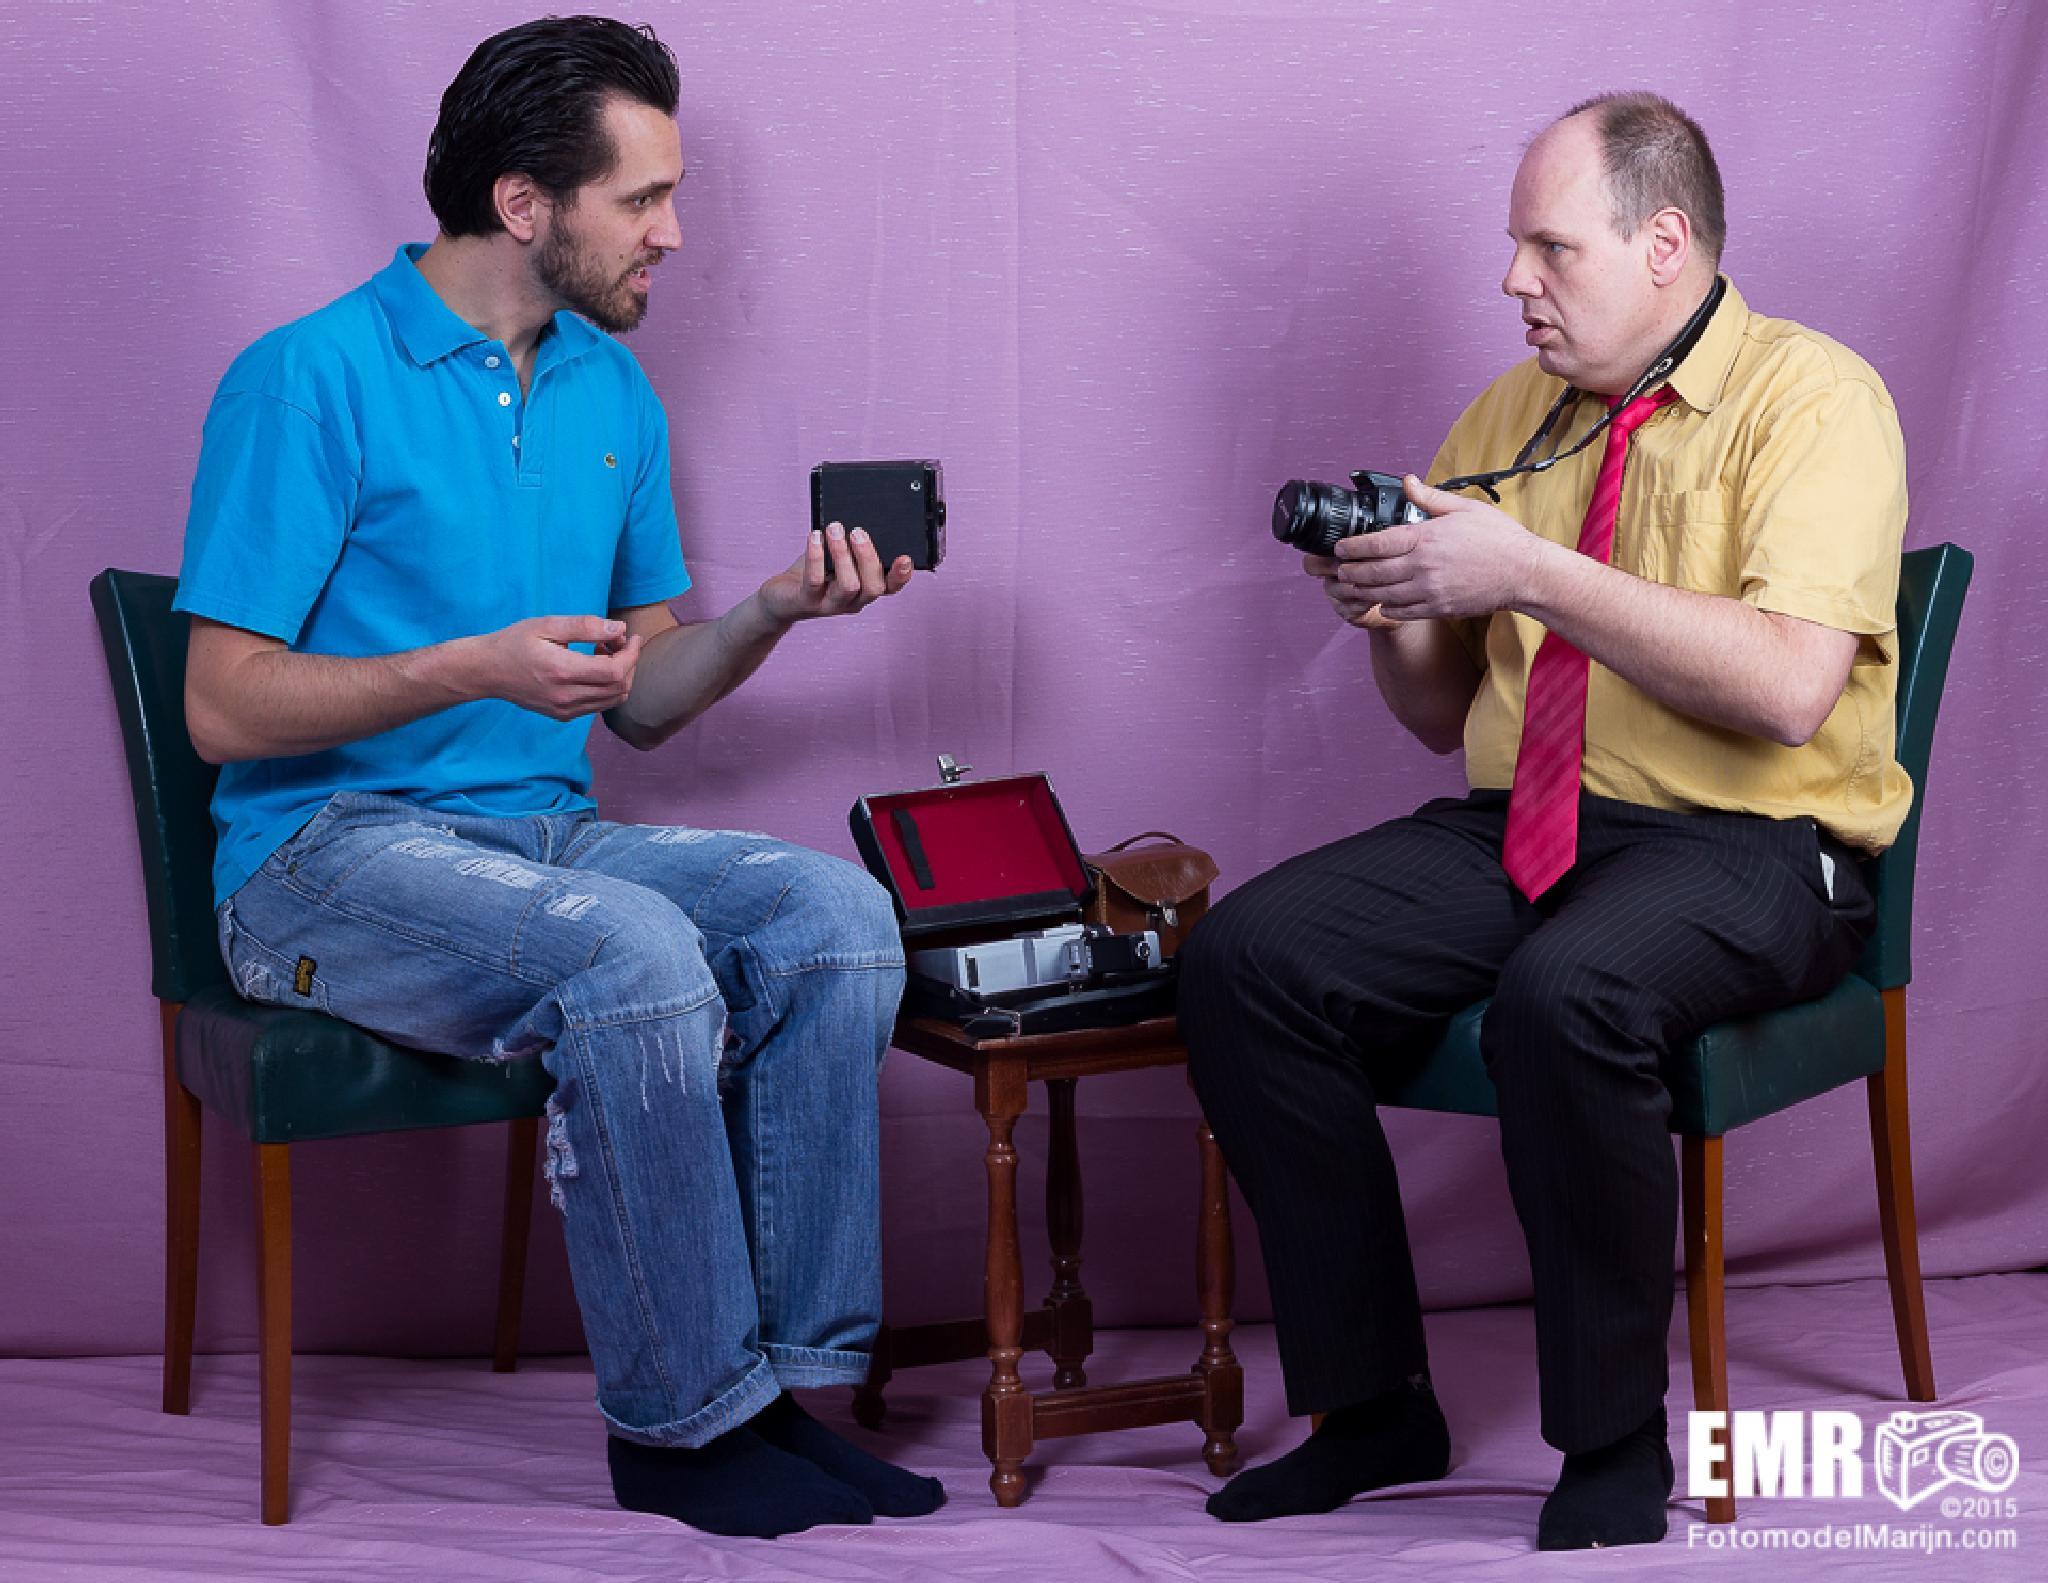 Rob & me by EMR Photography & Fotomodel Marijn